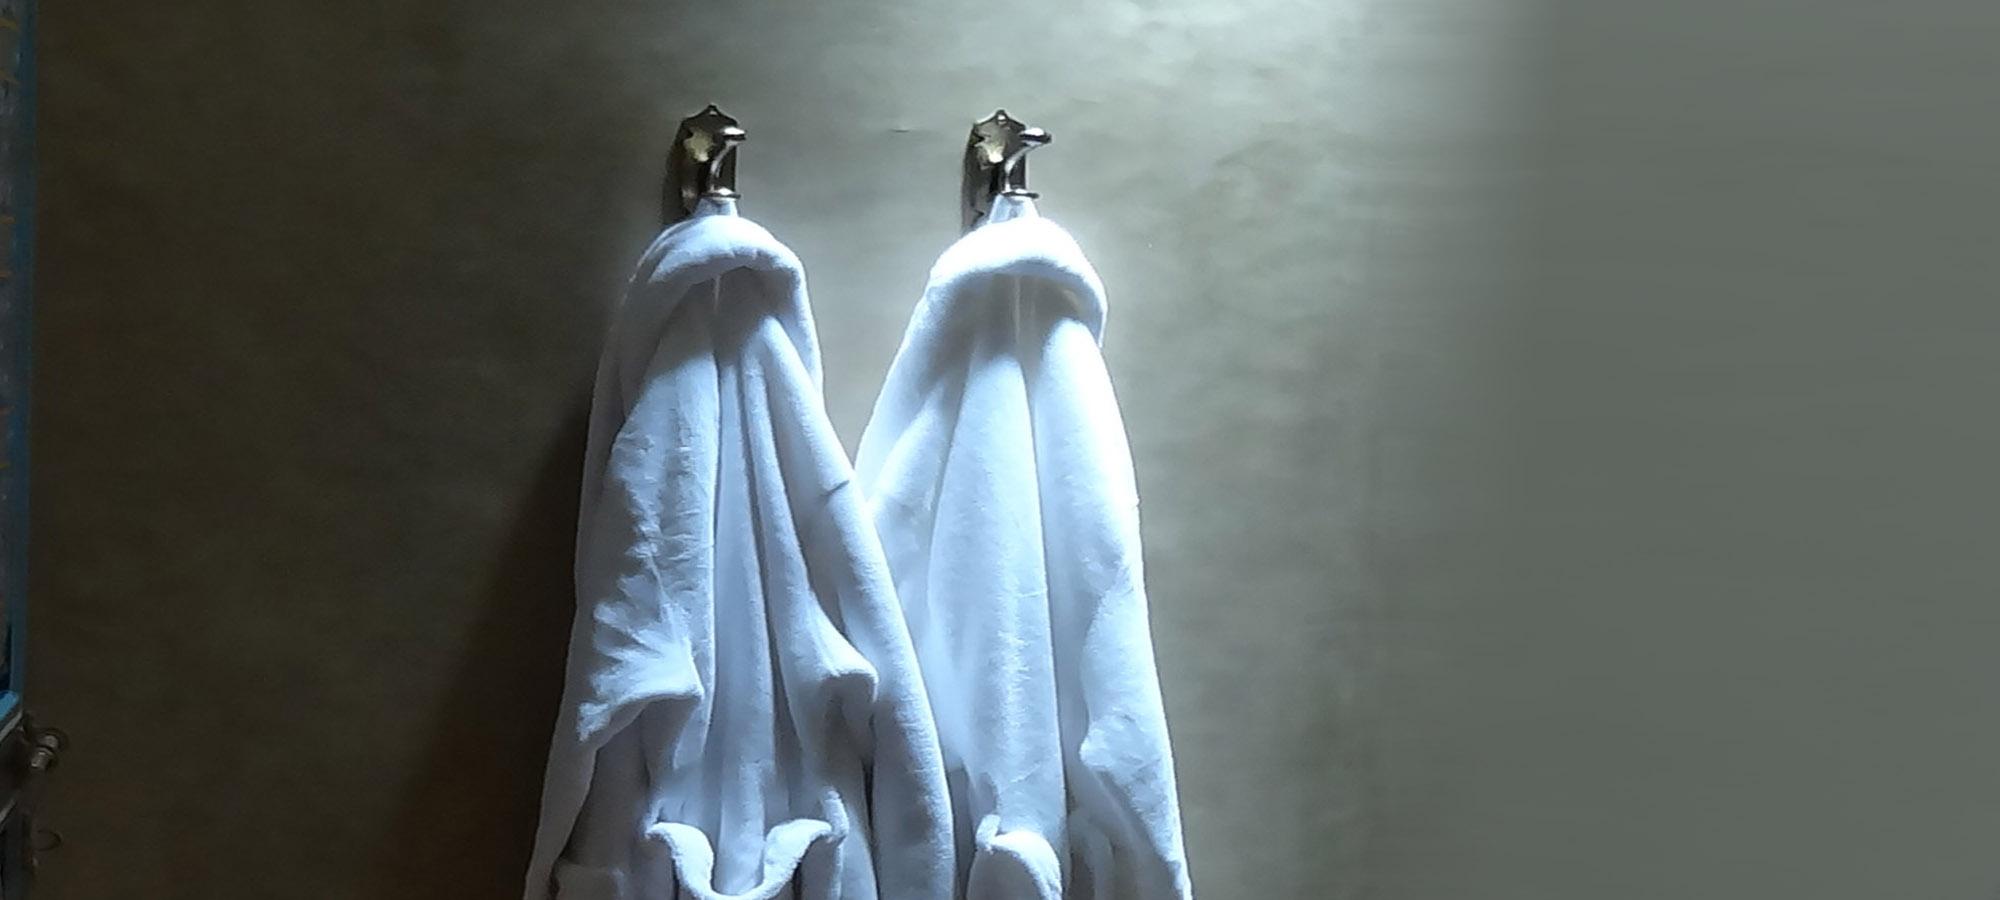 Dressing Gowns copy.jpg